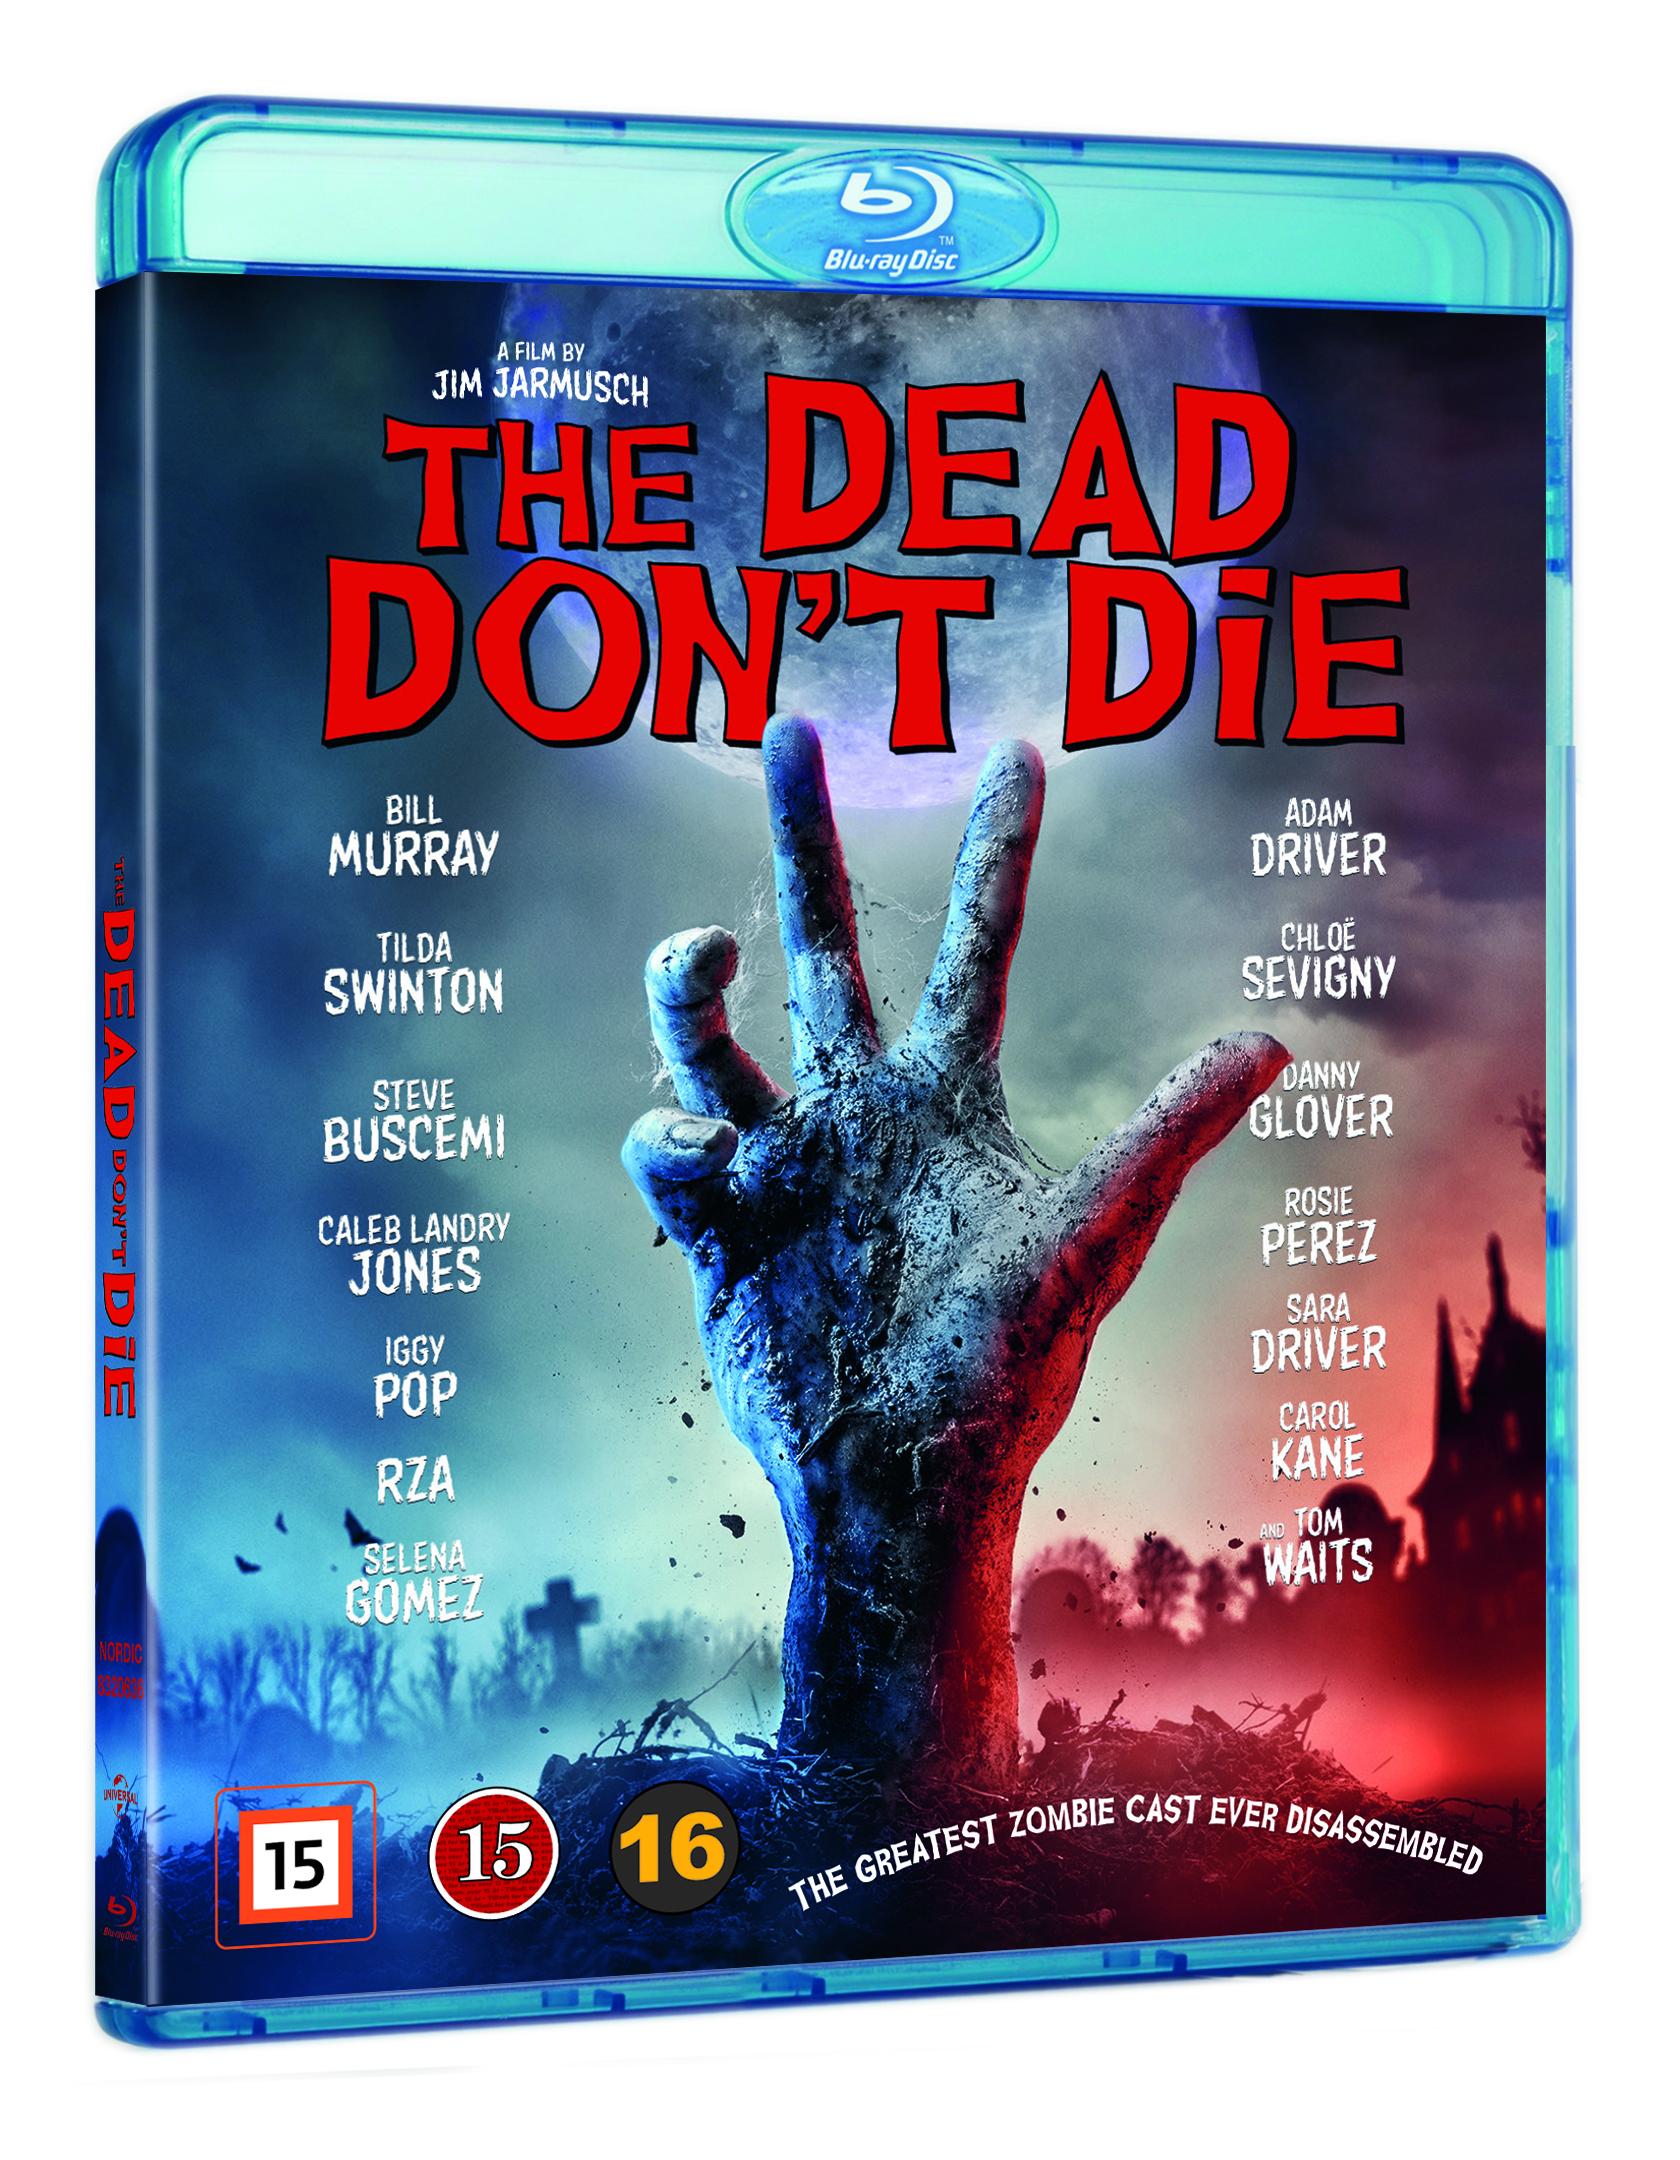 The Dead Don't Die - Jim Jarmusch - Film -  - 5053083206369 - 16/1-2020